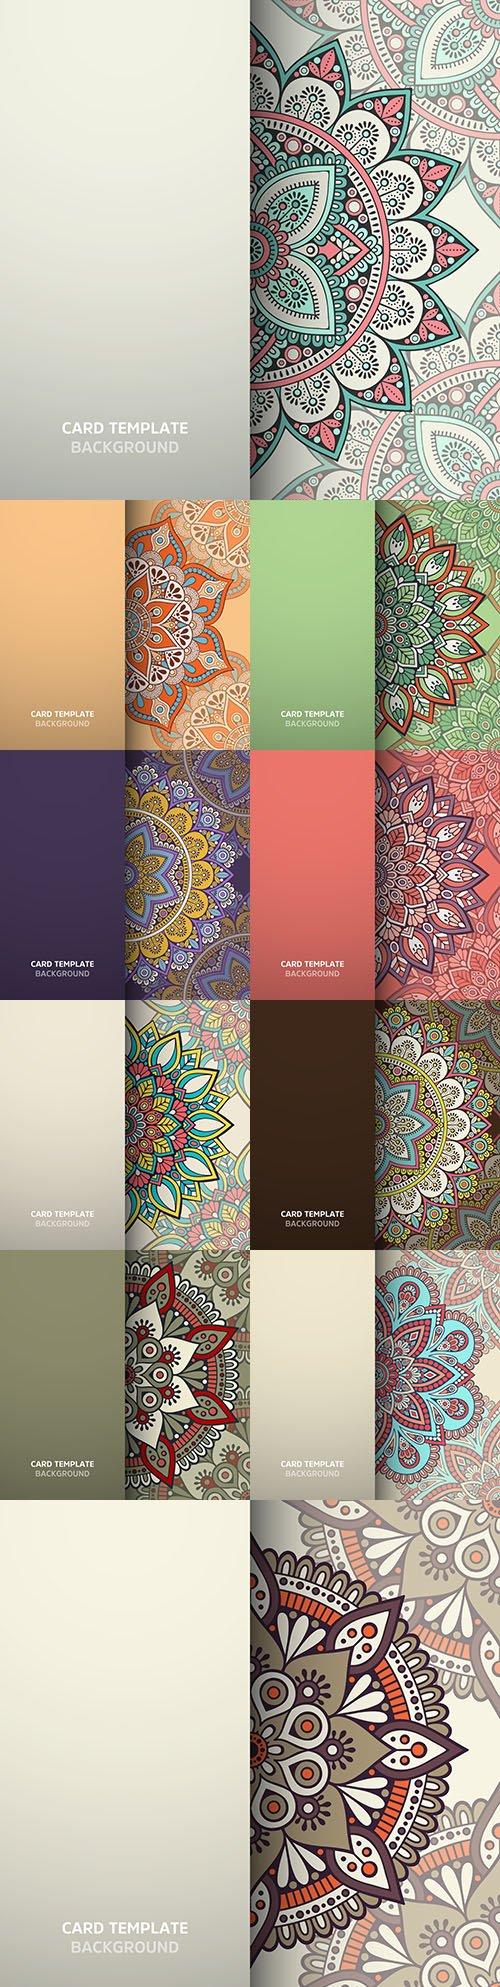 Mandala card pattern color design seamless background